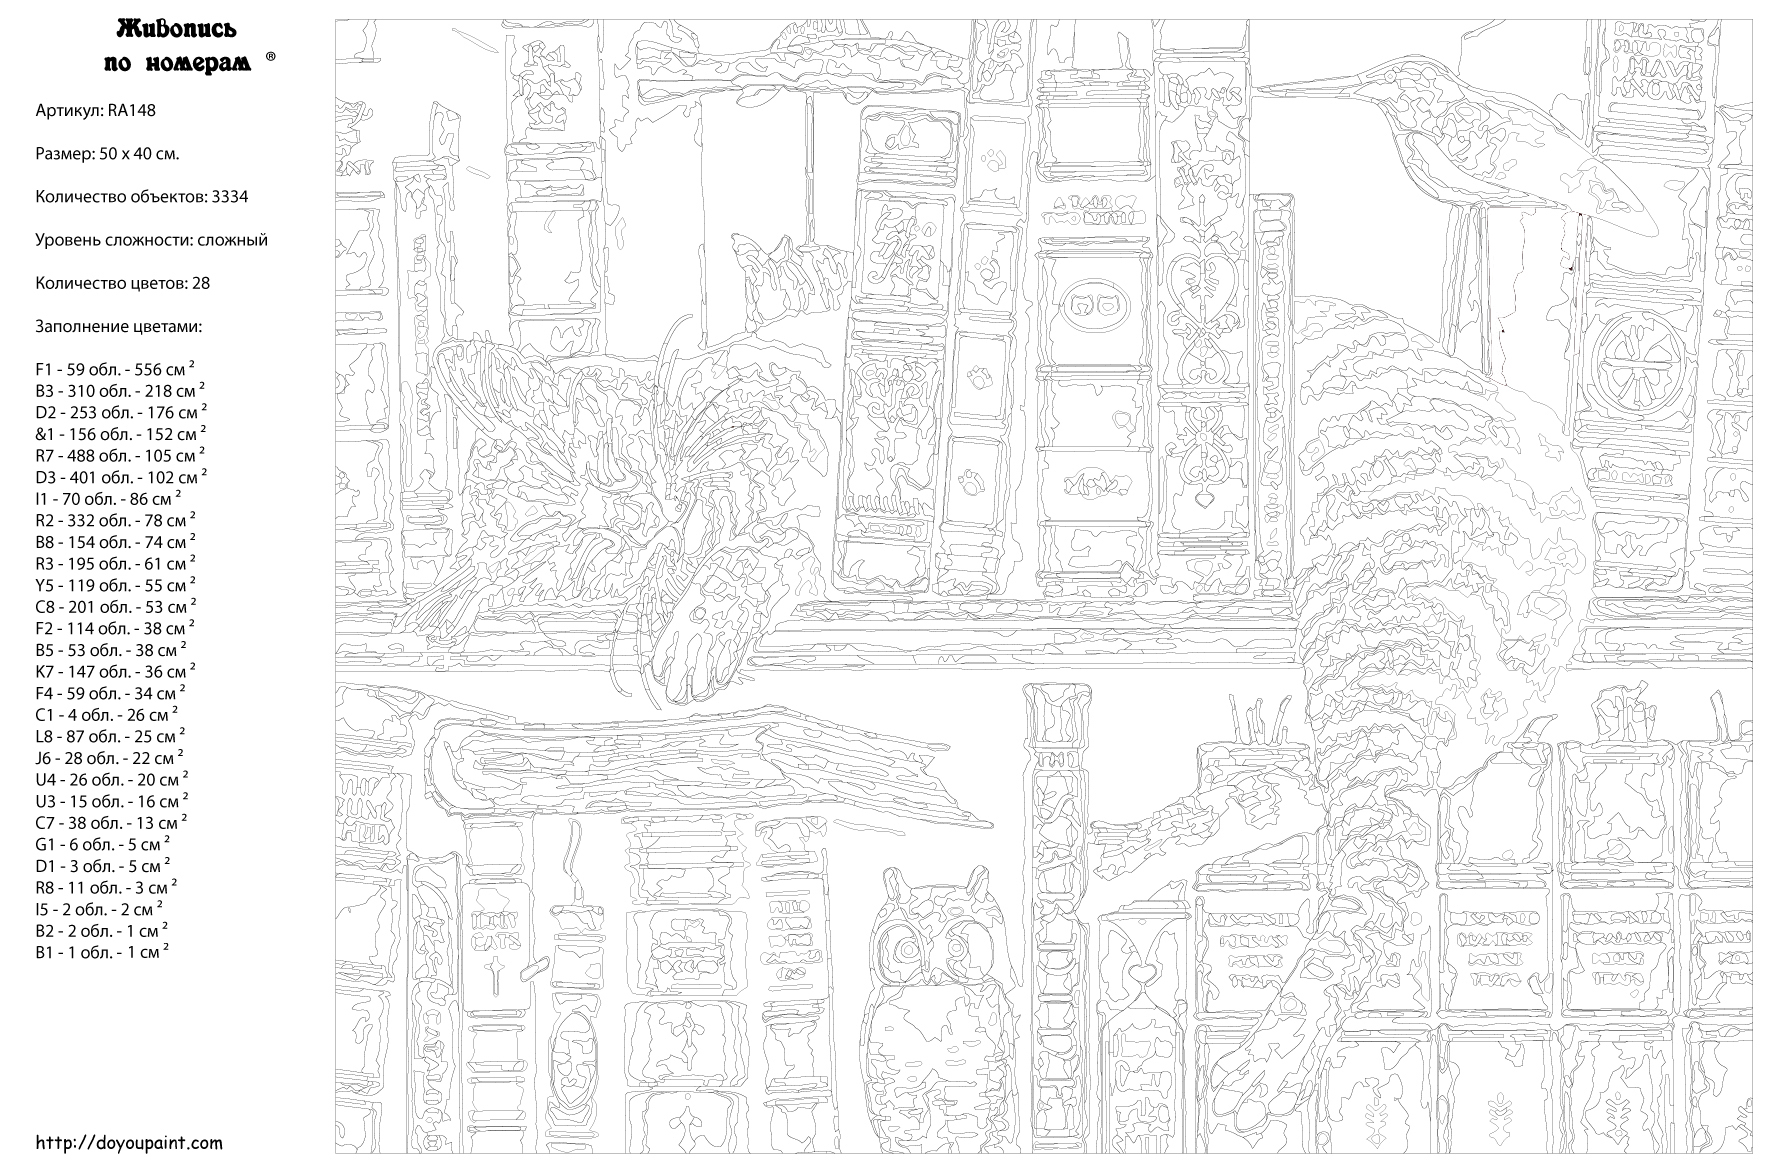 Картина по номерам, 40 x 50 см, RA148 Живопись по номерам